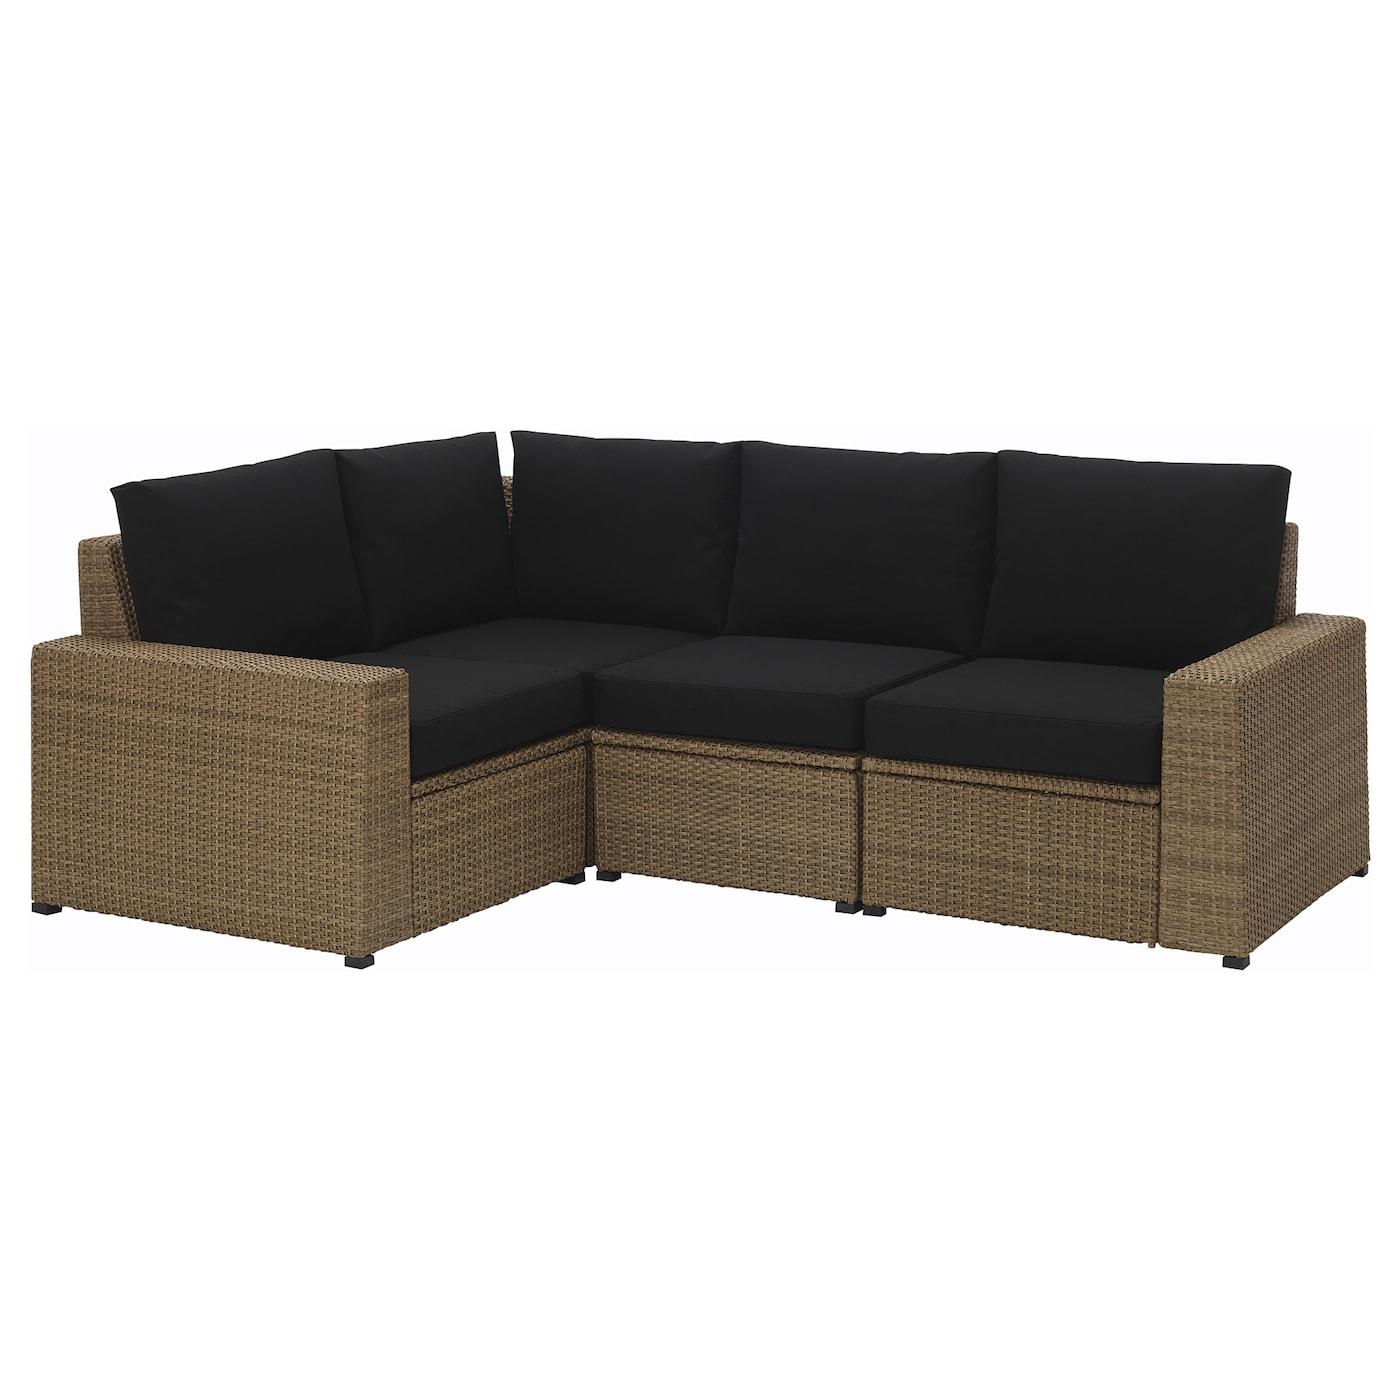 Soller n corner sofa 3 1 outdoor brown kungs black ikea - Sofa exterior ikea ...